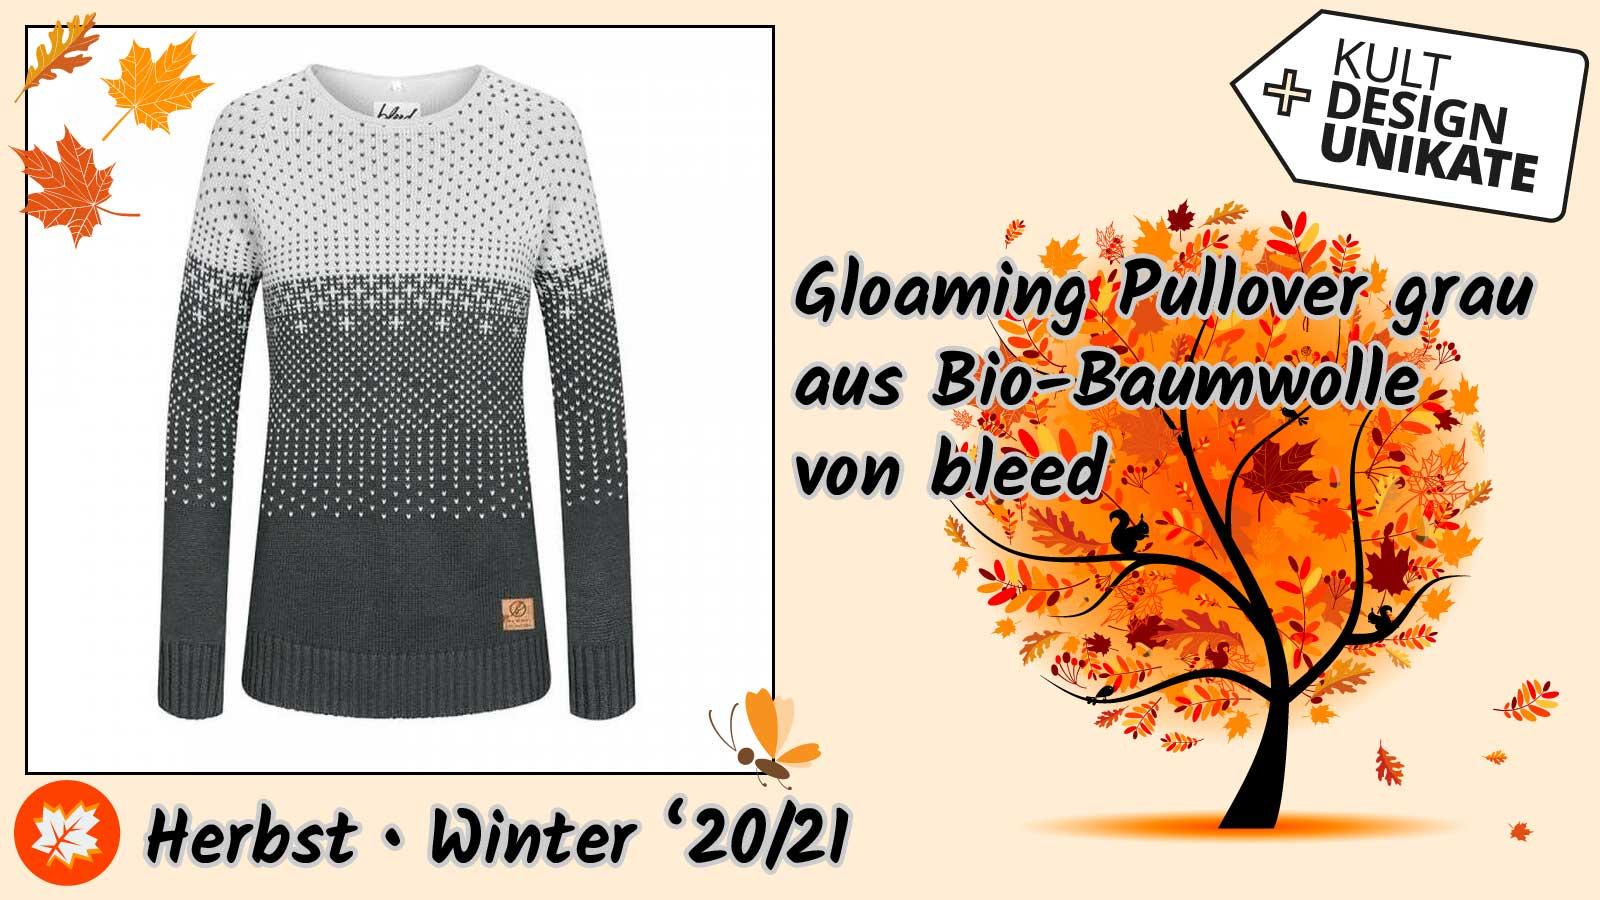 bleed-Gloaming-Pullover-grau